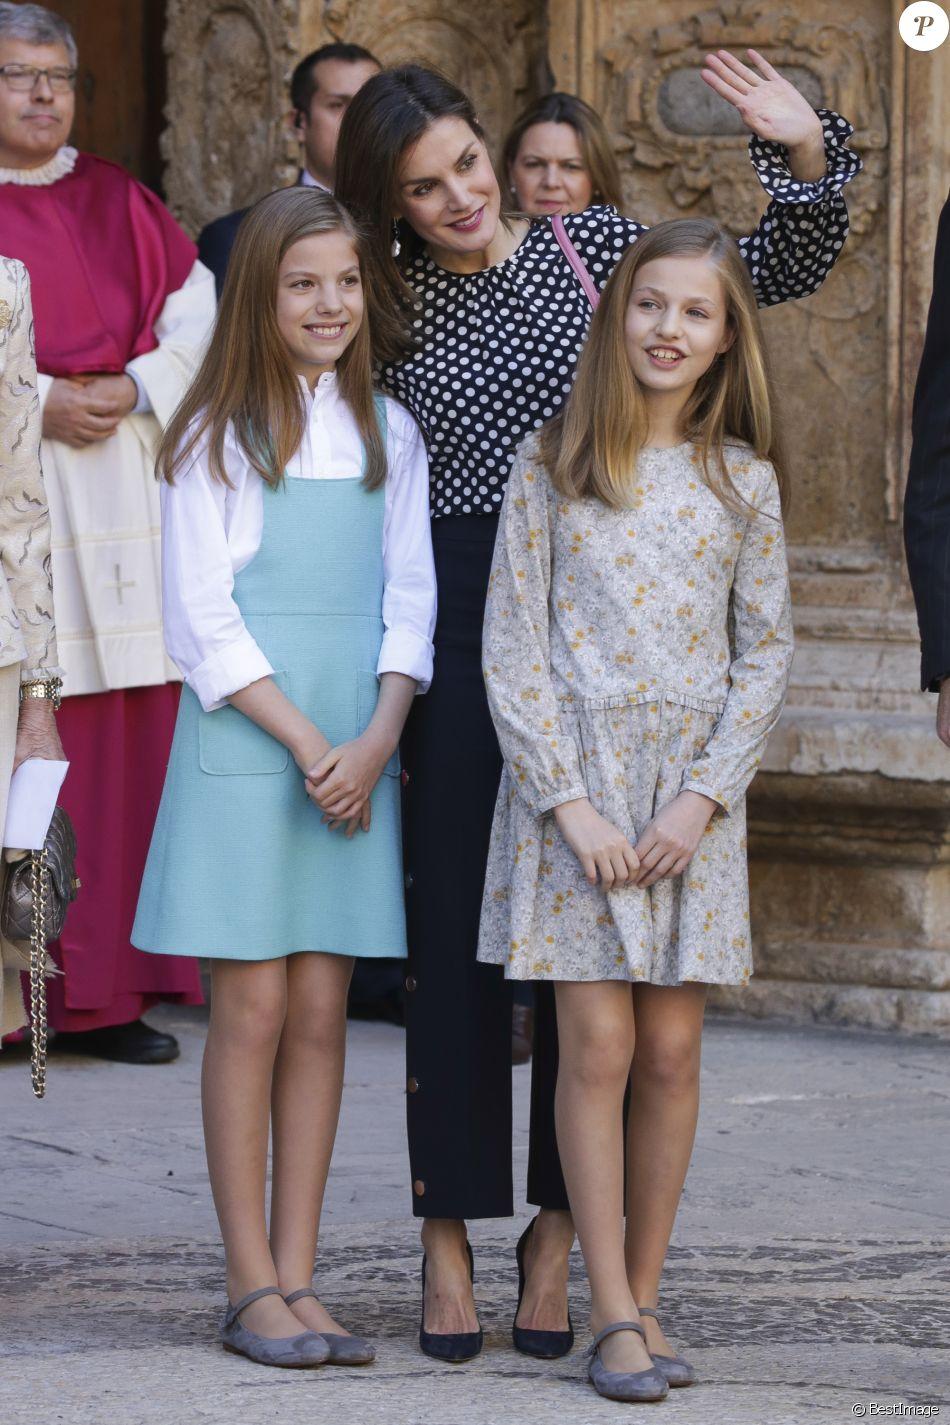 Roi Et Reine D Espagne : reine, espagne, Reine, Letizia, Filles., Felipe, Espagne,, Leurs, Filles, Princesse, Leonor, Asturies, L'infante, Sofia,, Ainsi, Purepeople